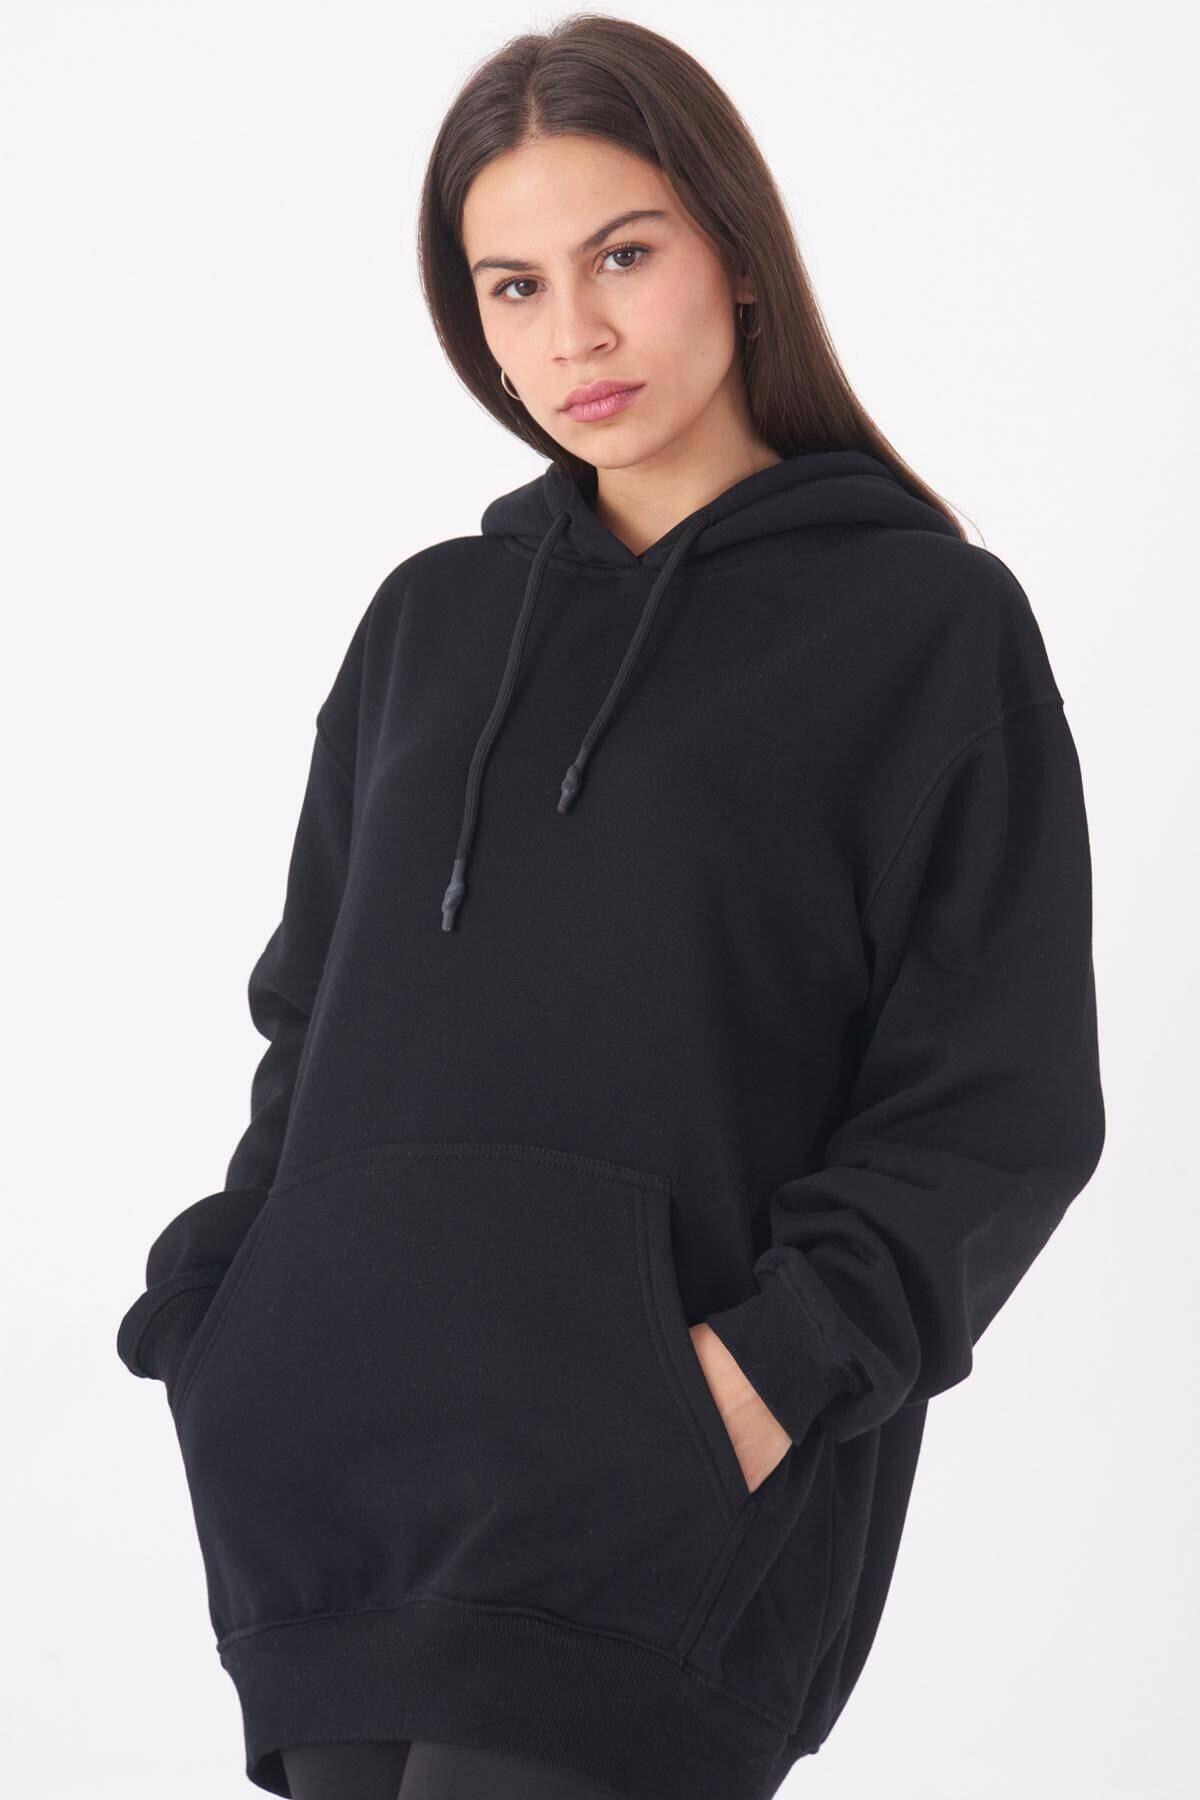 Addax Kadın Siyah Kapüşonlu Oversize Sweat S0925 - N4 - P3 ADX-0000022256 2